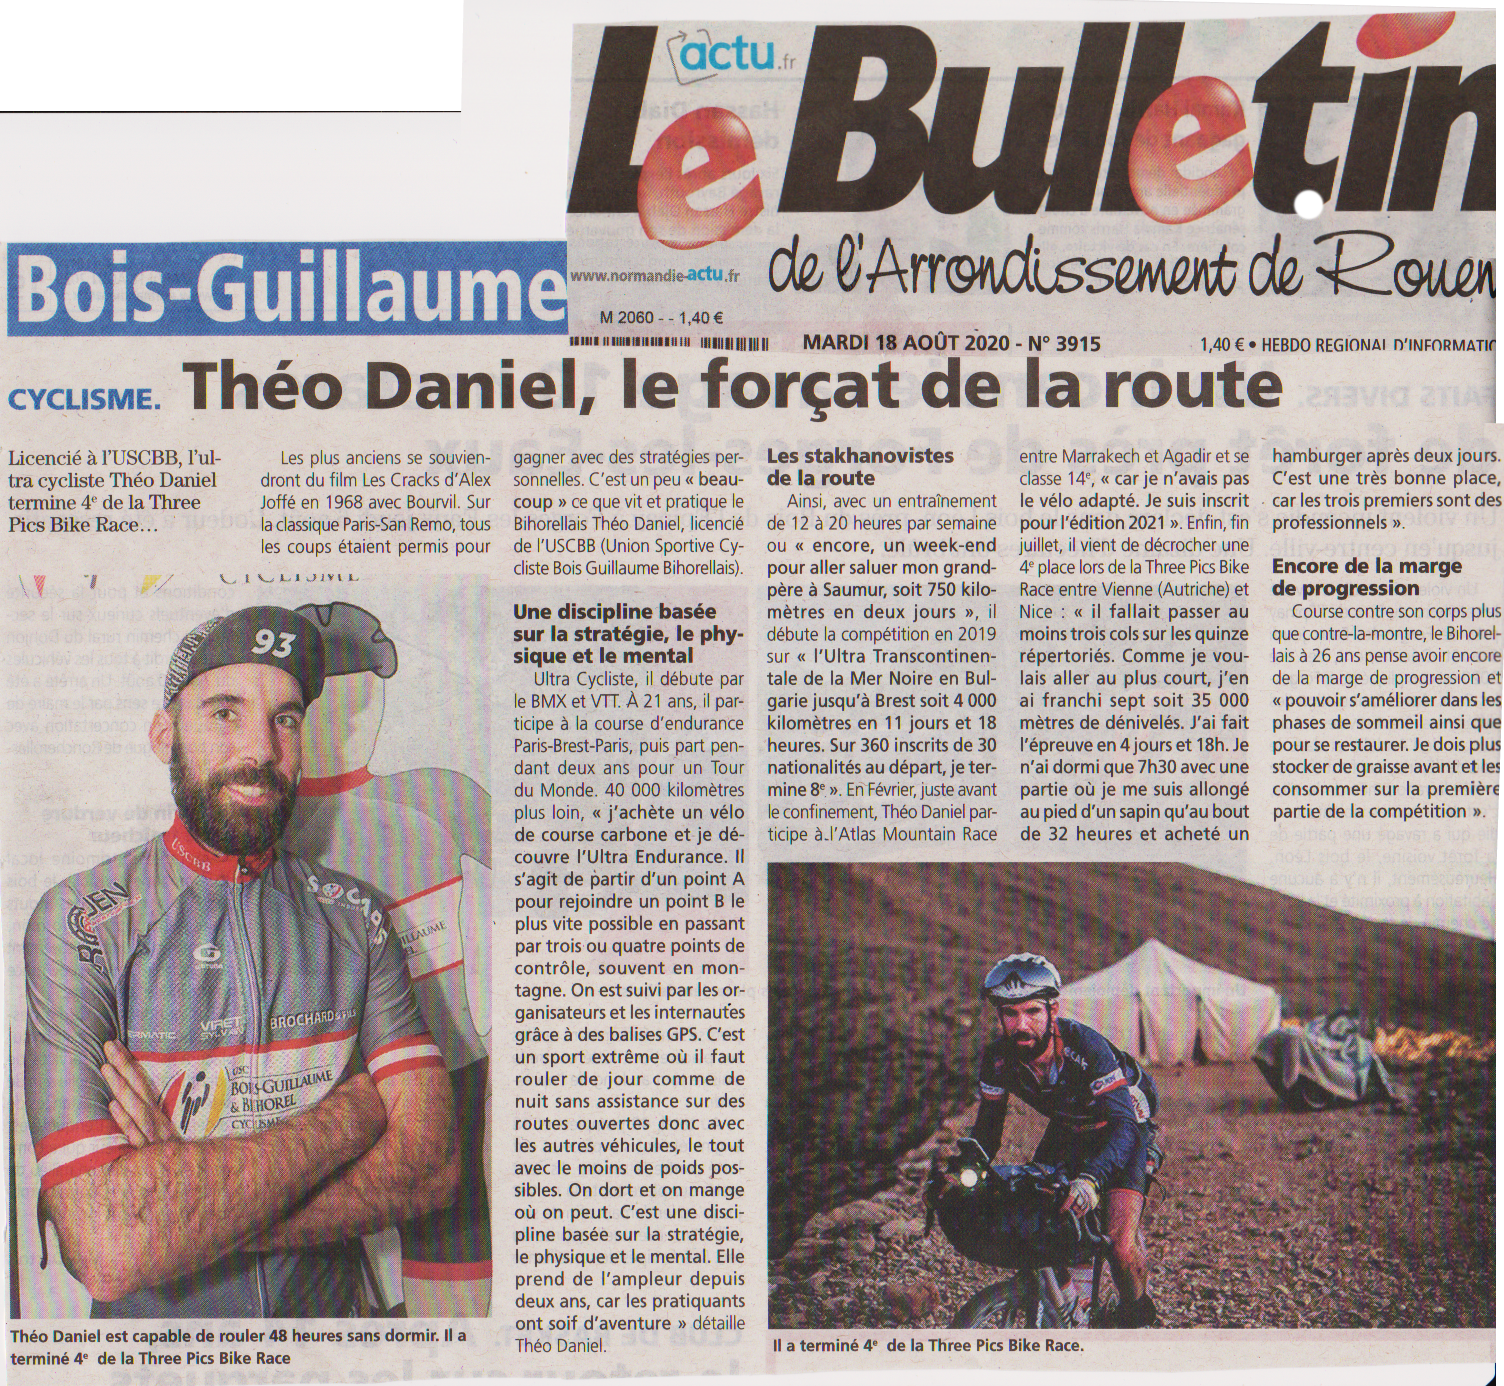 Bulletin Rouen 8. 2020 Théo Daniel